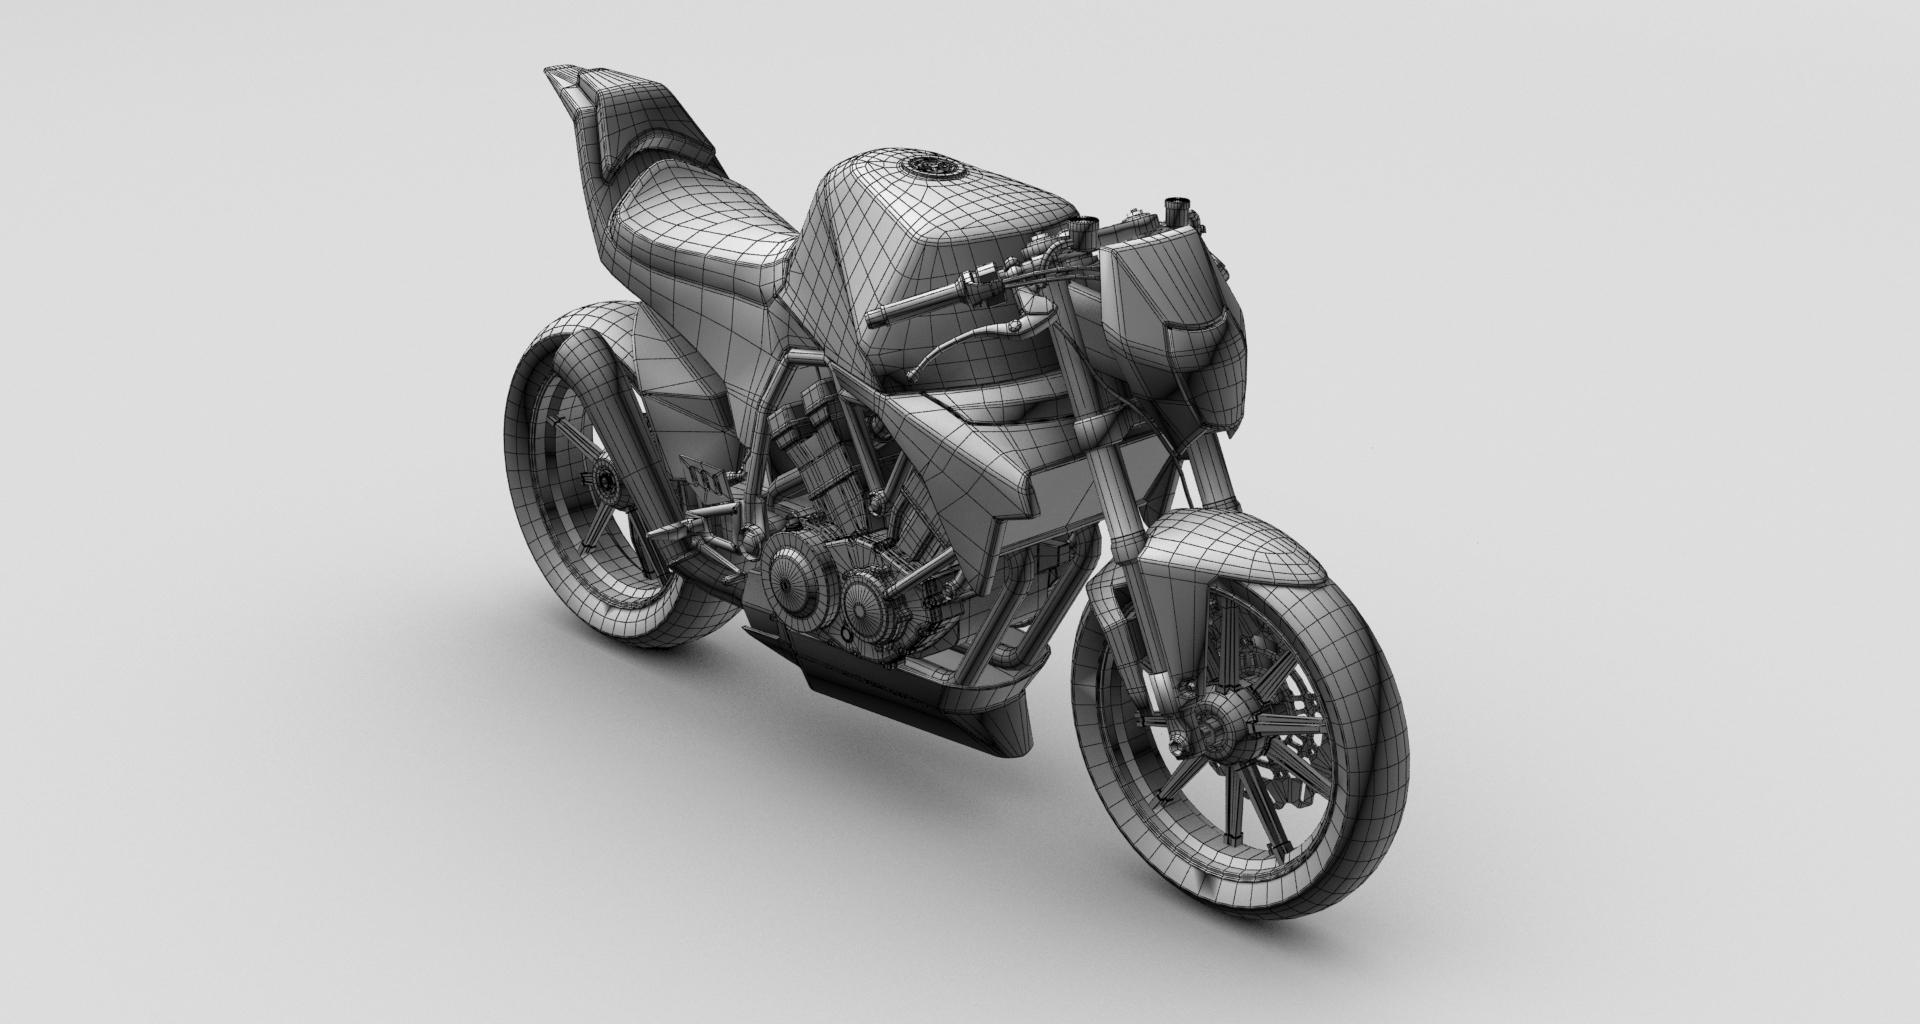 2016_MotoRacer4_F.Beudin_MotoRoadster2-AO-Front